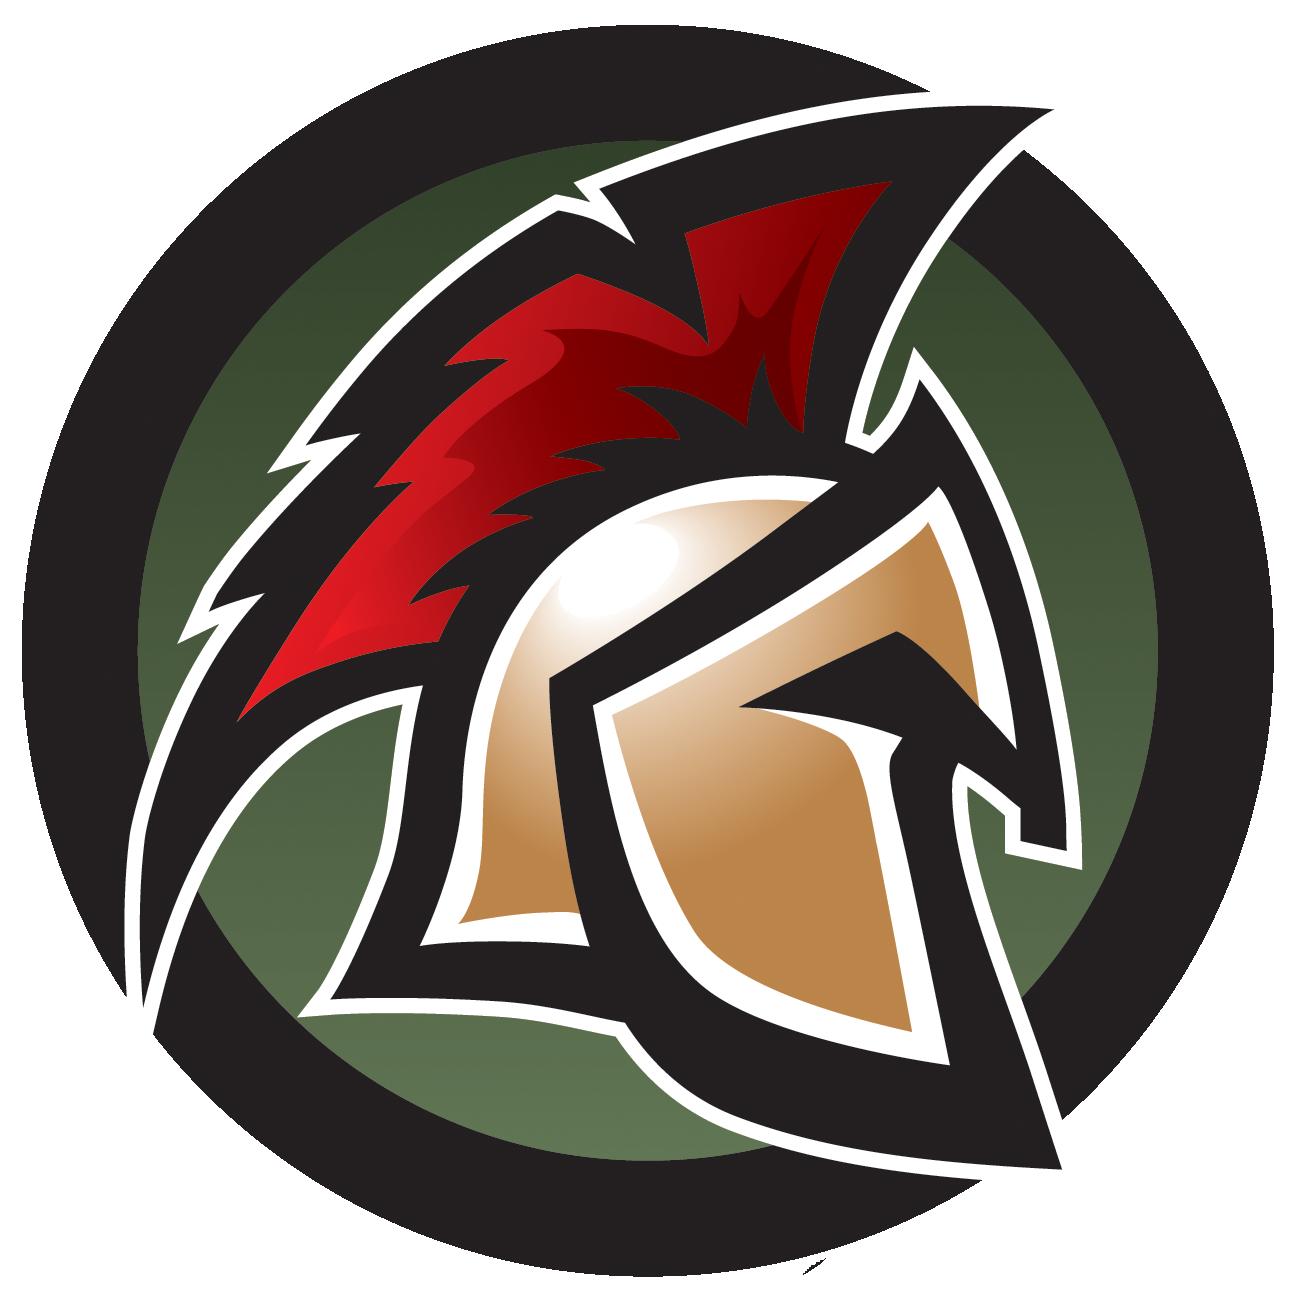 Helmet n free image. Spartan clipart logo spartan